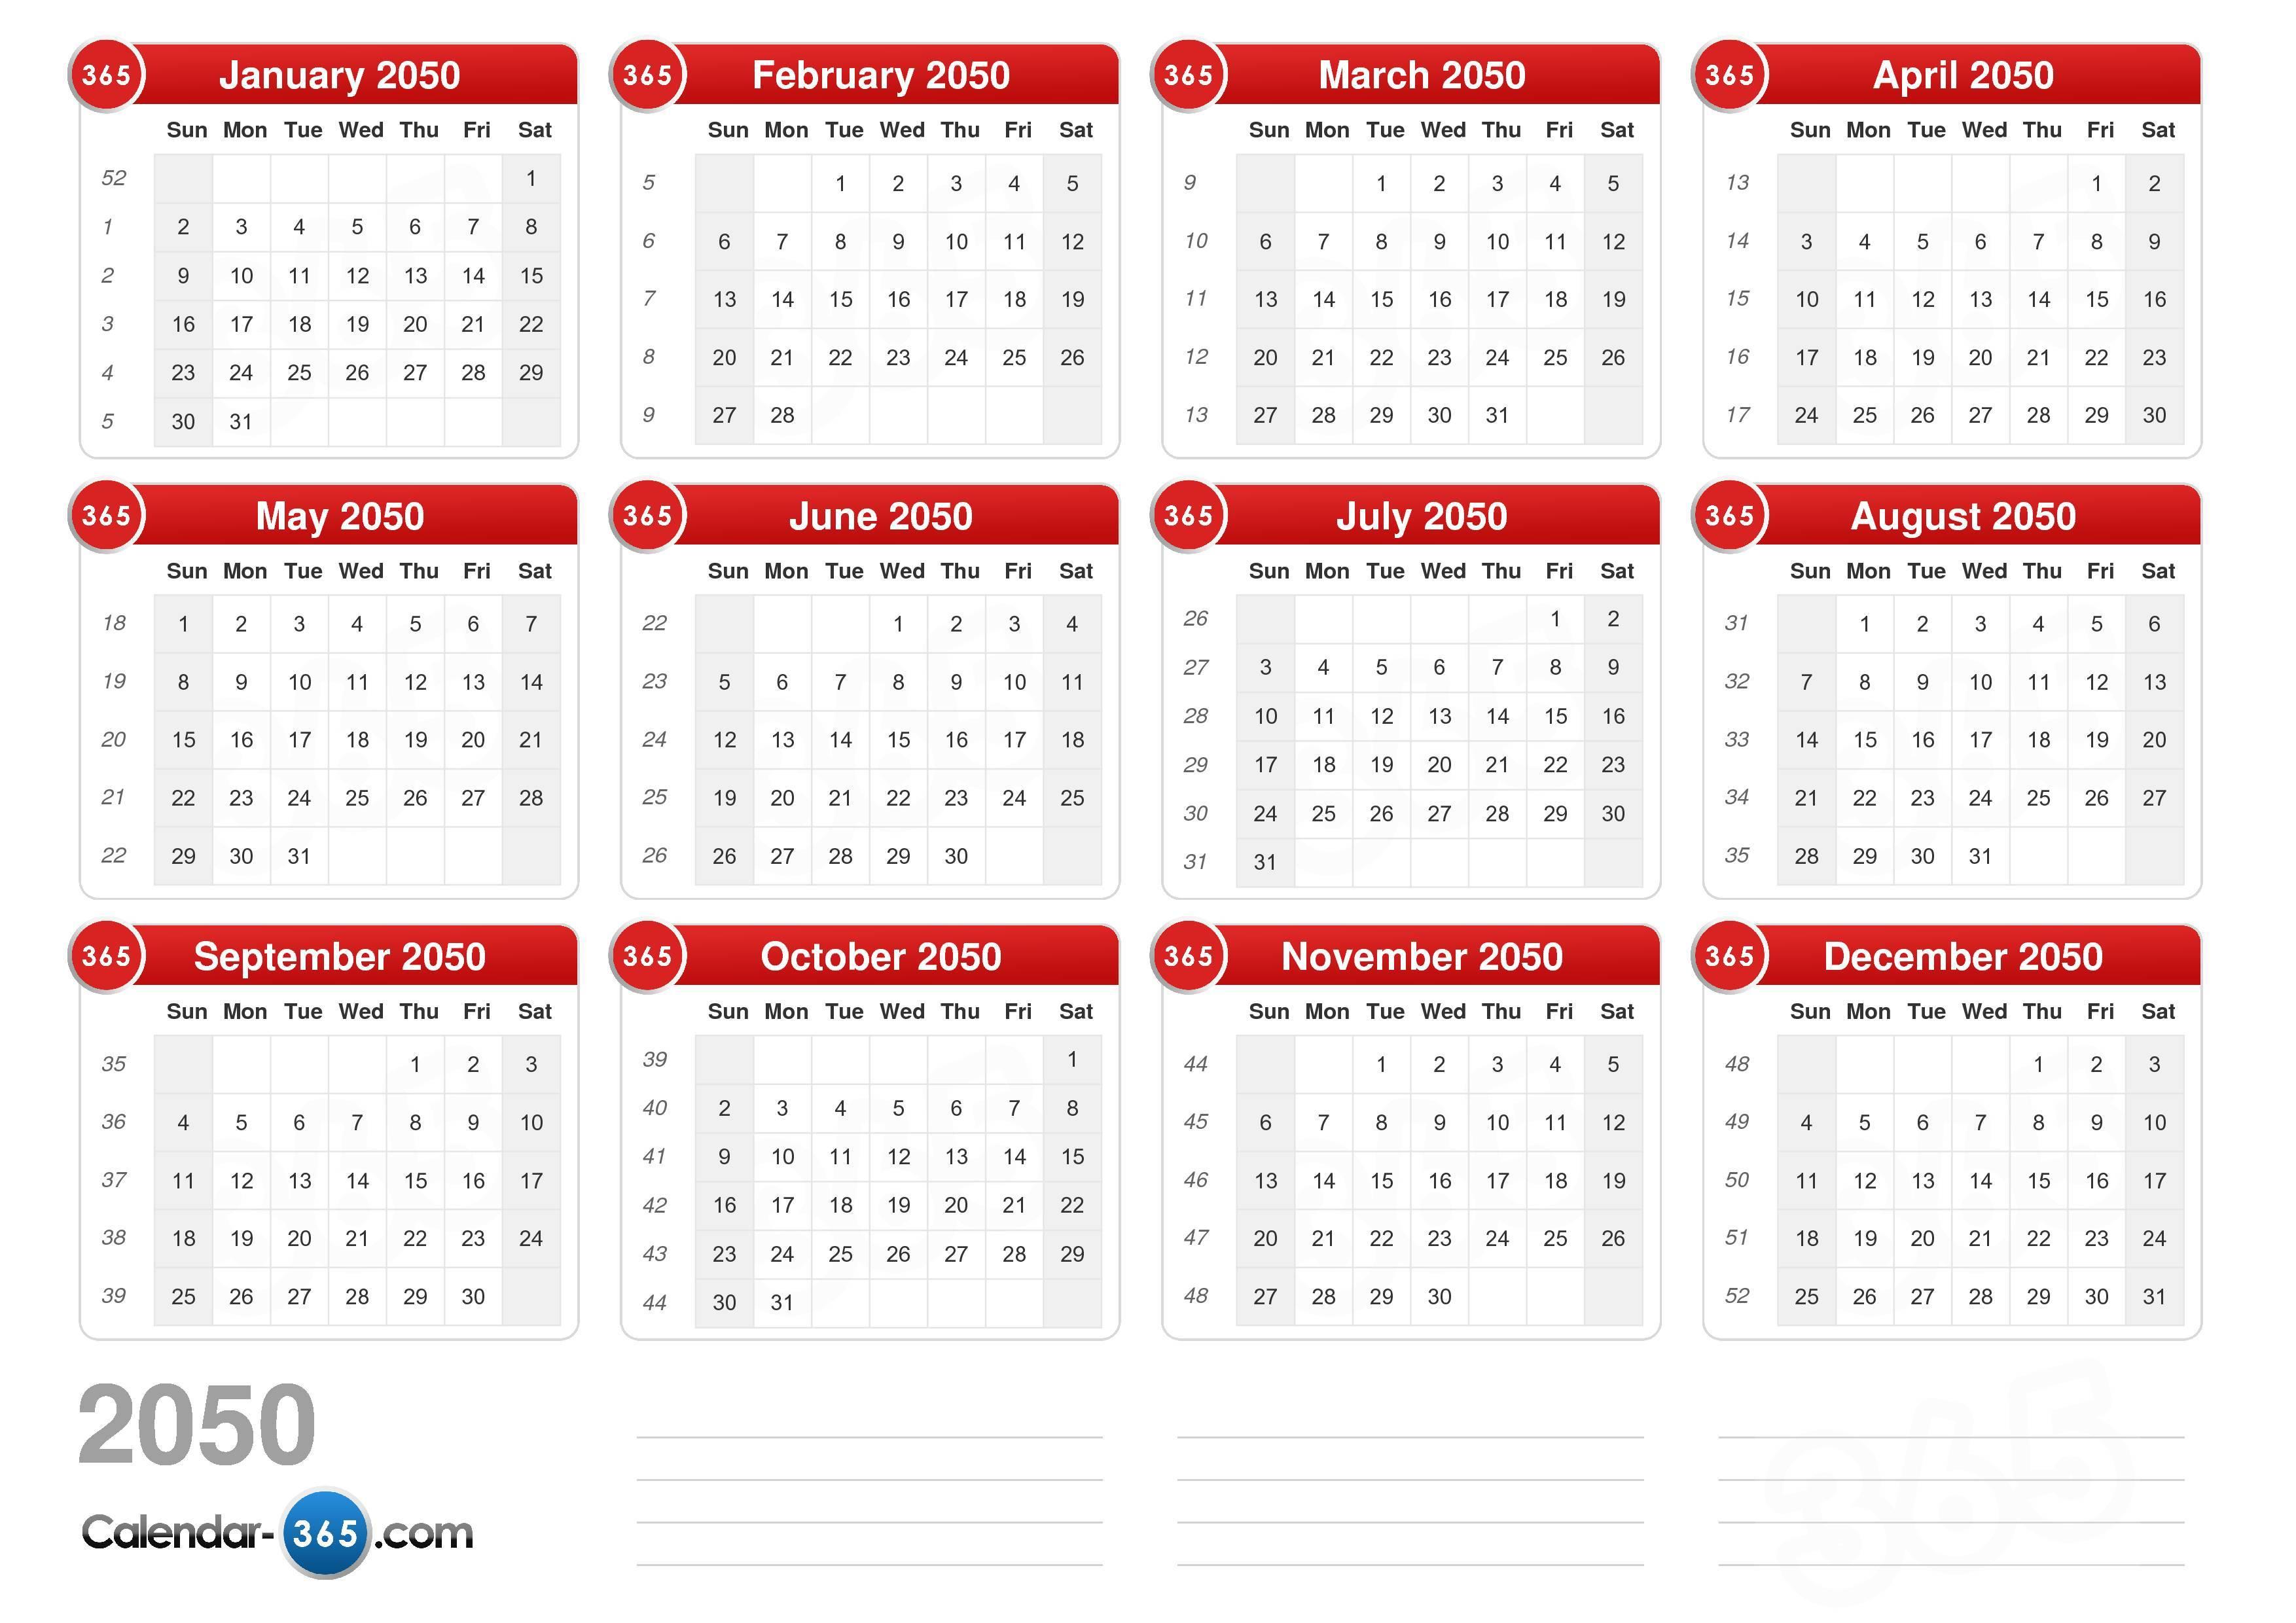 ... calendar without holidays landscape format 1 page 2050 calendar 184 1